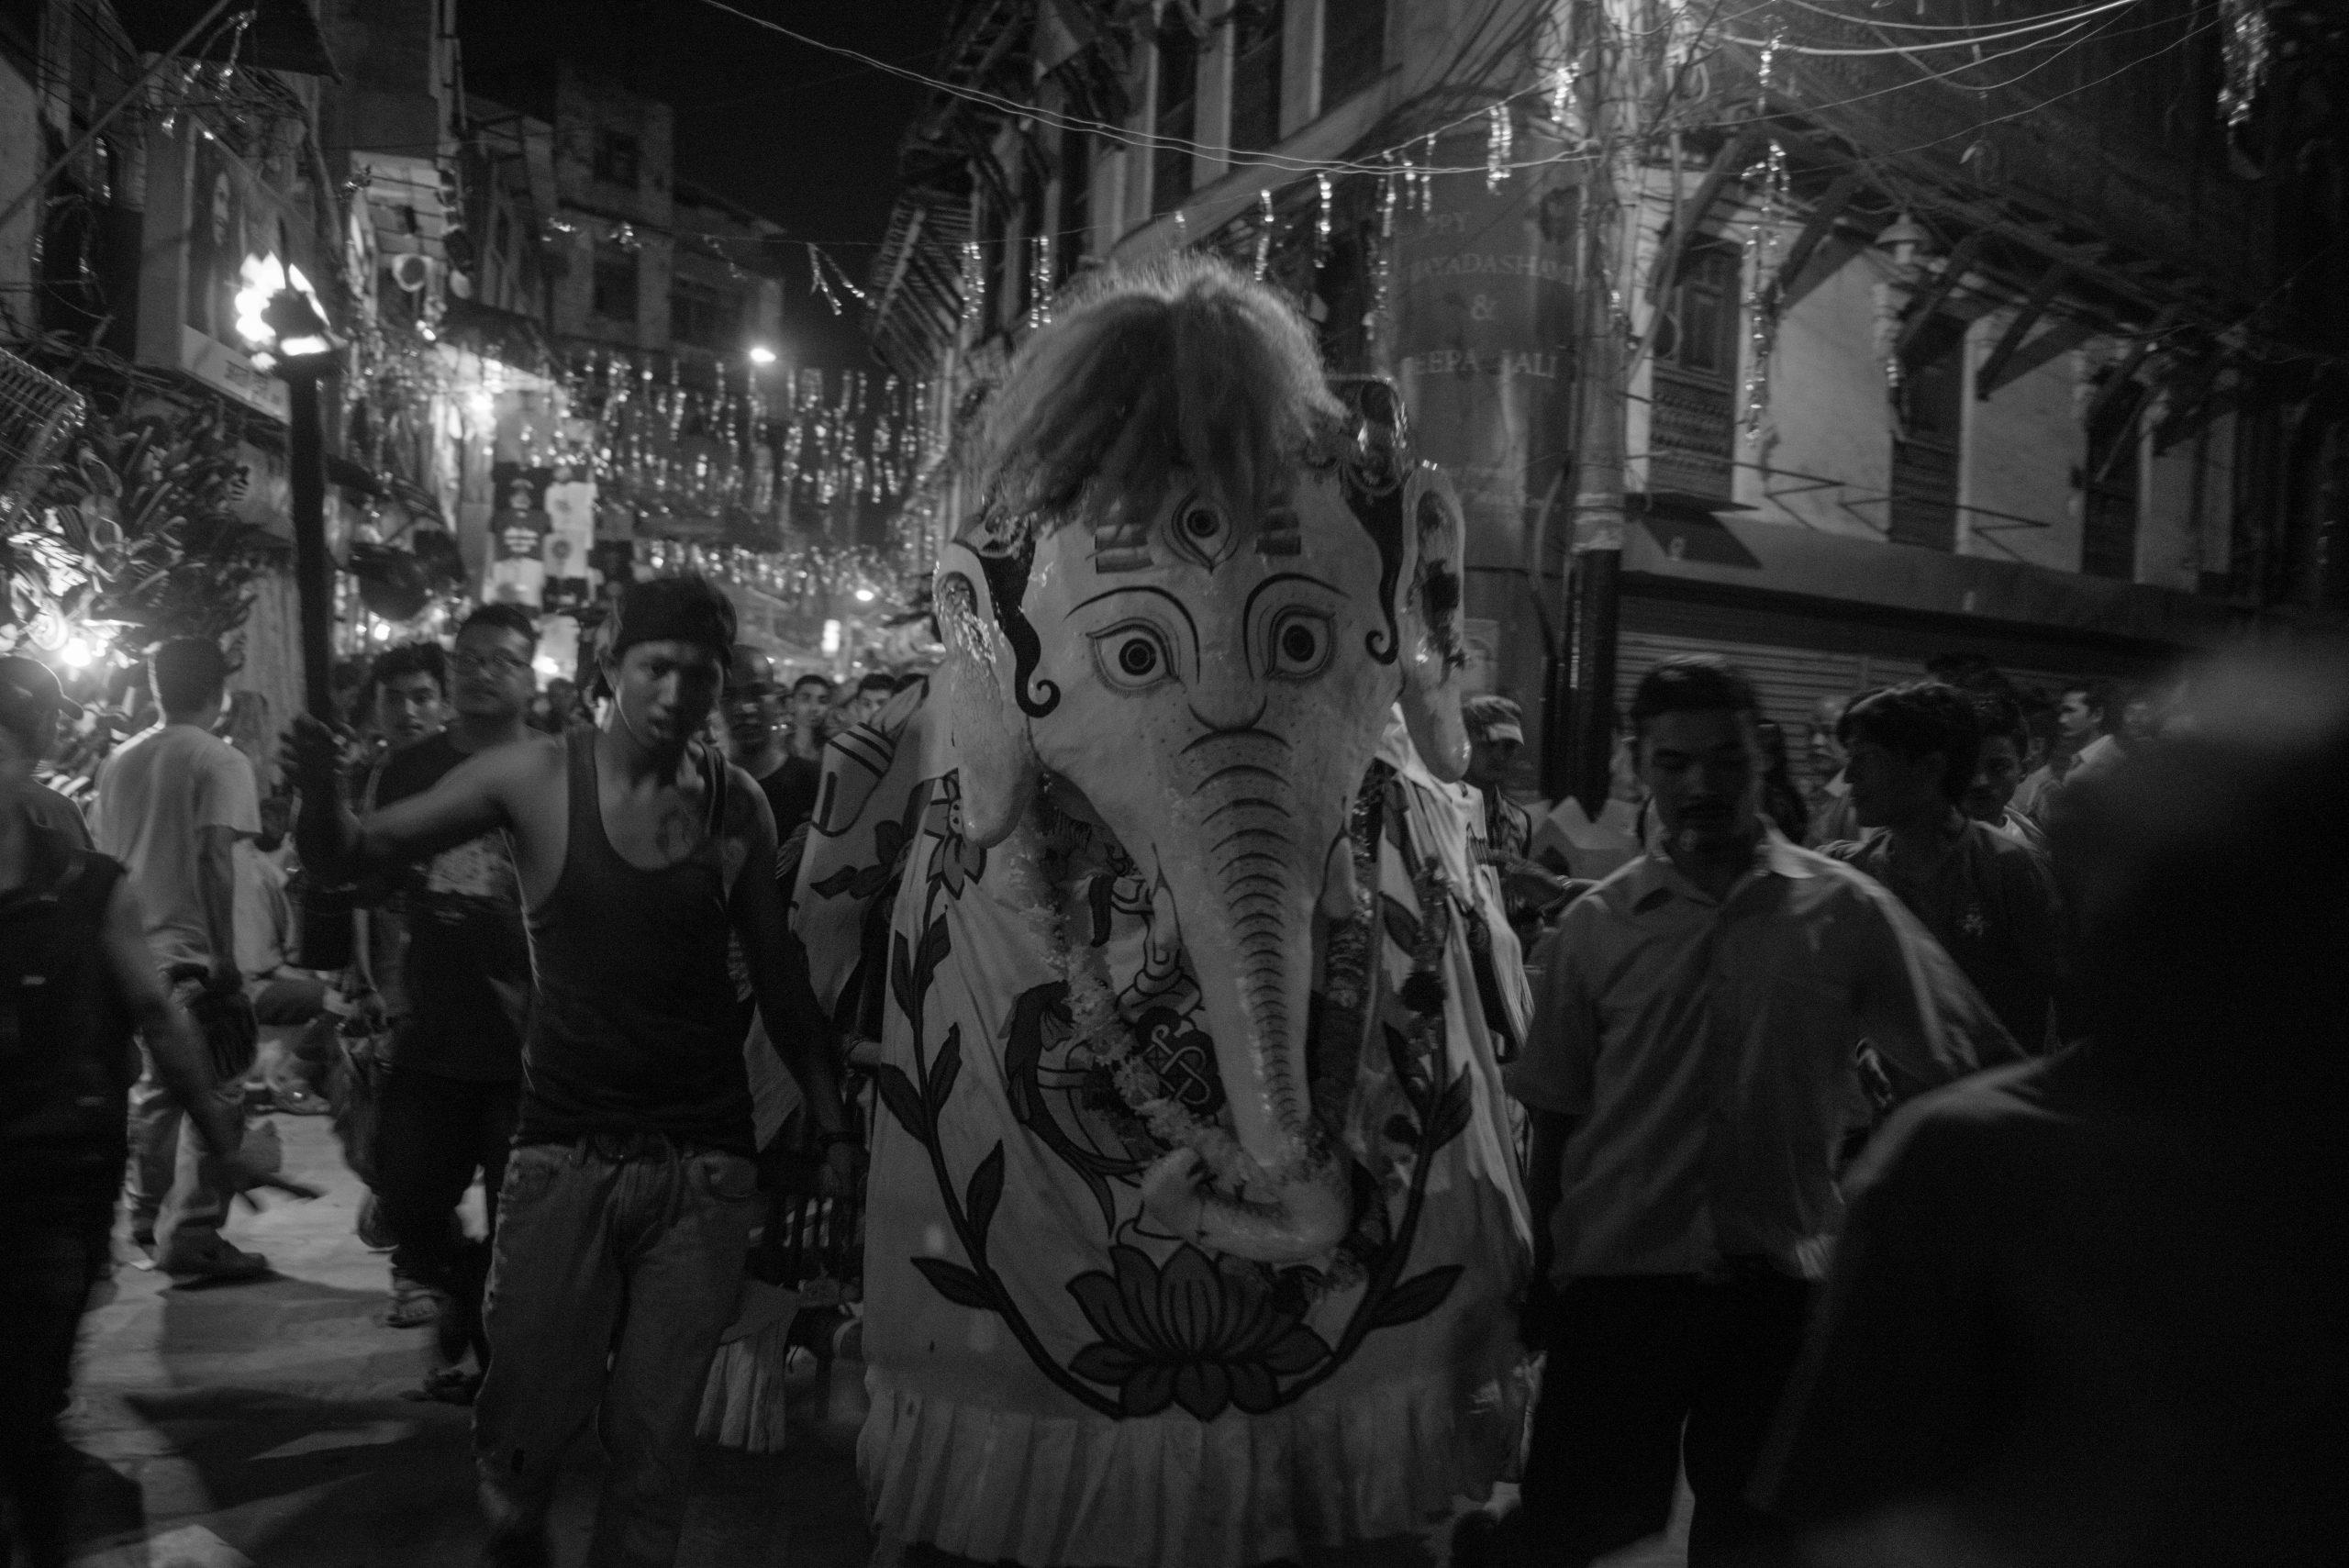 Kathmandu festival, Nepal